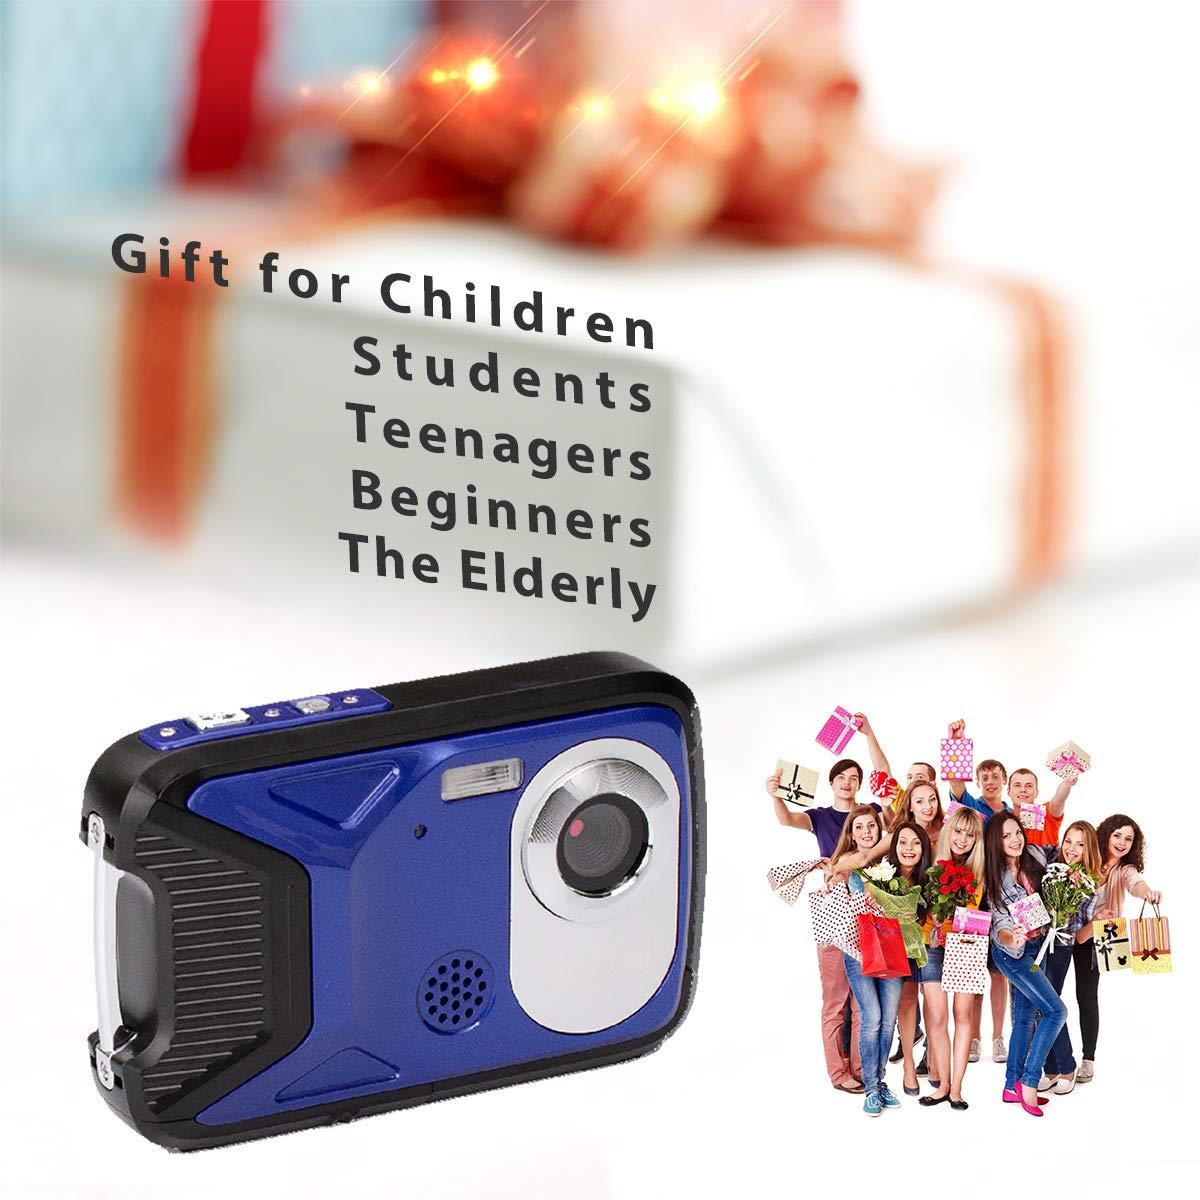 "GDC8026 Waterproof Digital Camera// 8x Digital Zoom// 16 MP// 1080P FHD// 2.8/"" TFT LCD Screen//Underwater Camera for Children//Teenagers//Students//Beginners//The Elderly"